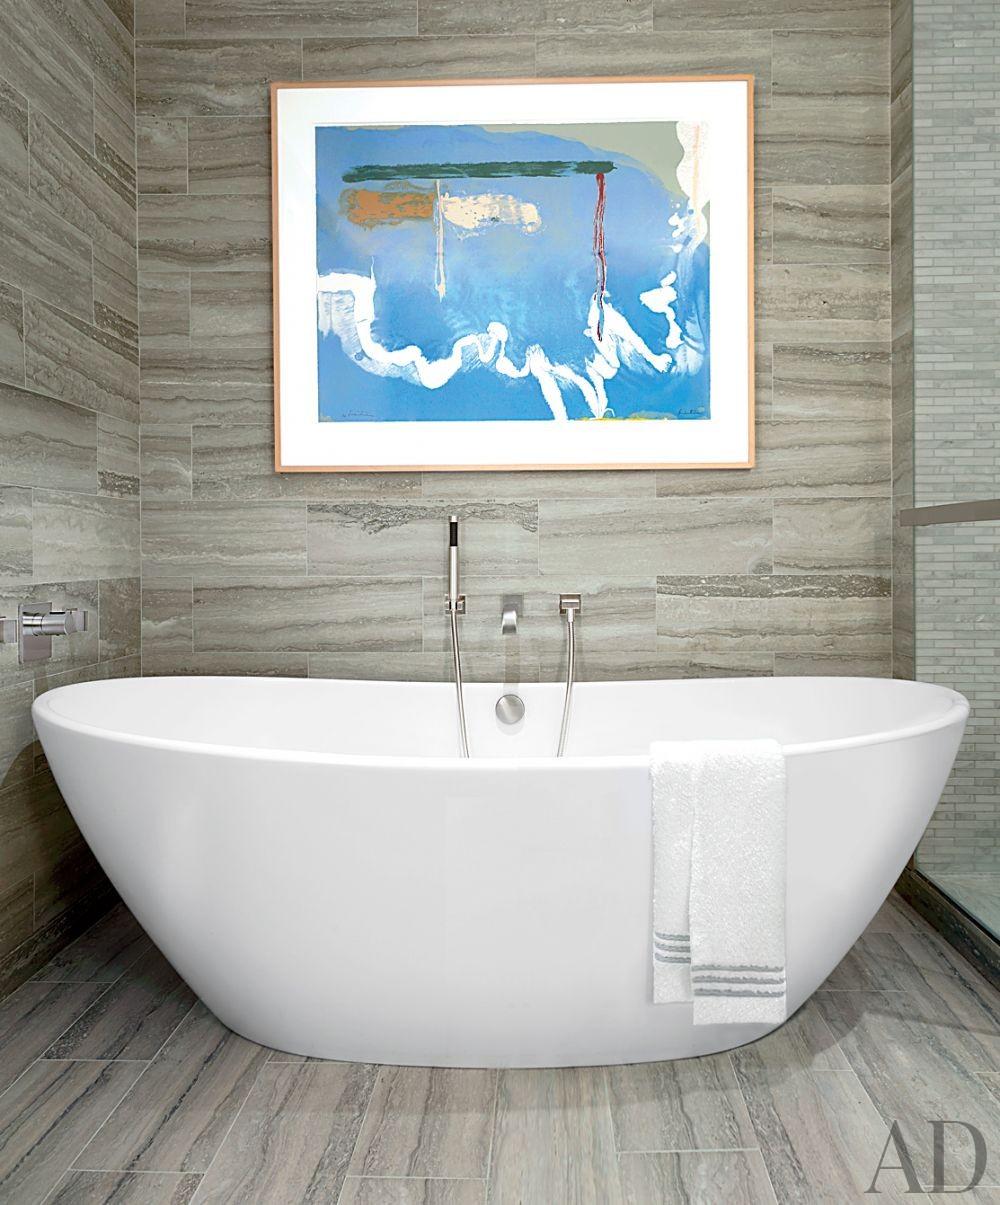 Modern Bathroom by Vicente Wolf Associates Inc. in New York, New York